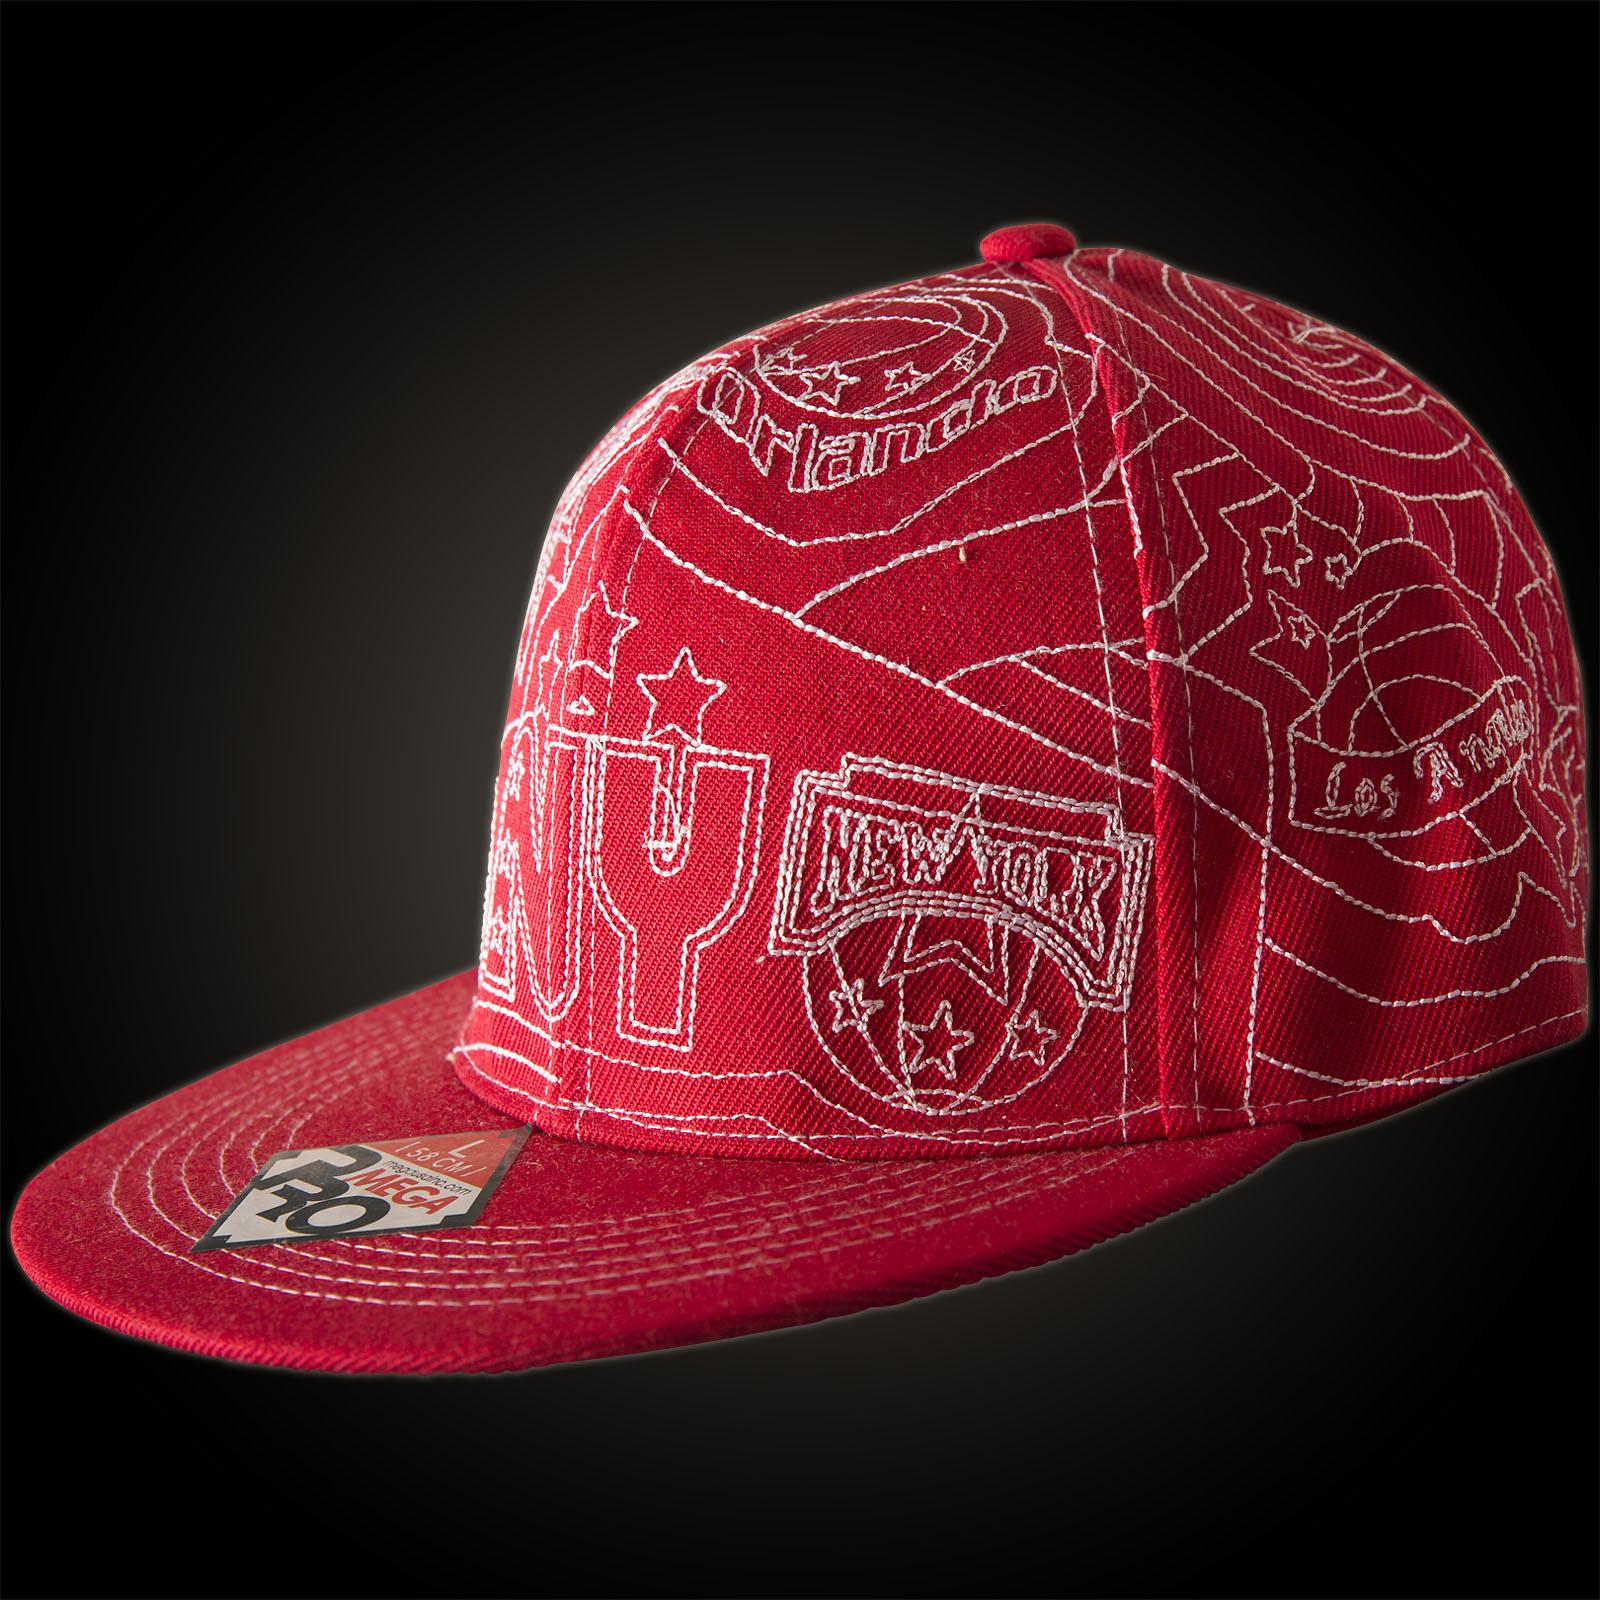 Mega USA New York Basketball Cap with an all over embroidery 9276a6bd3e1